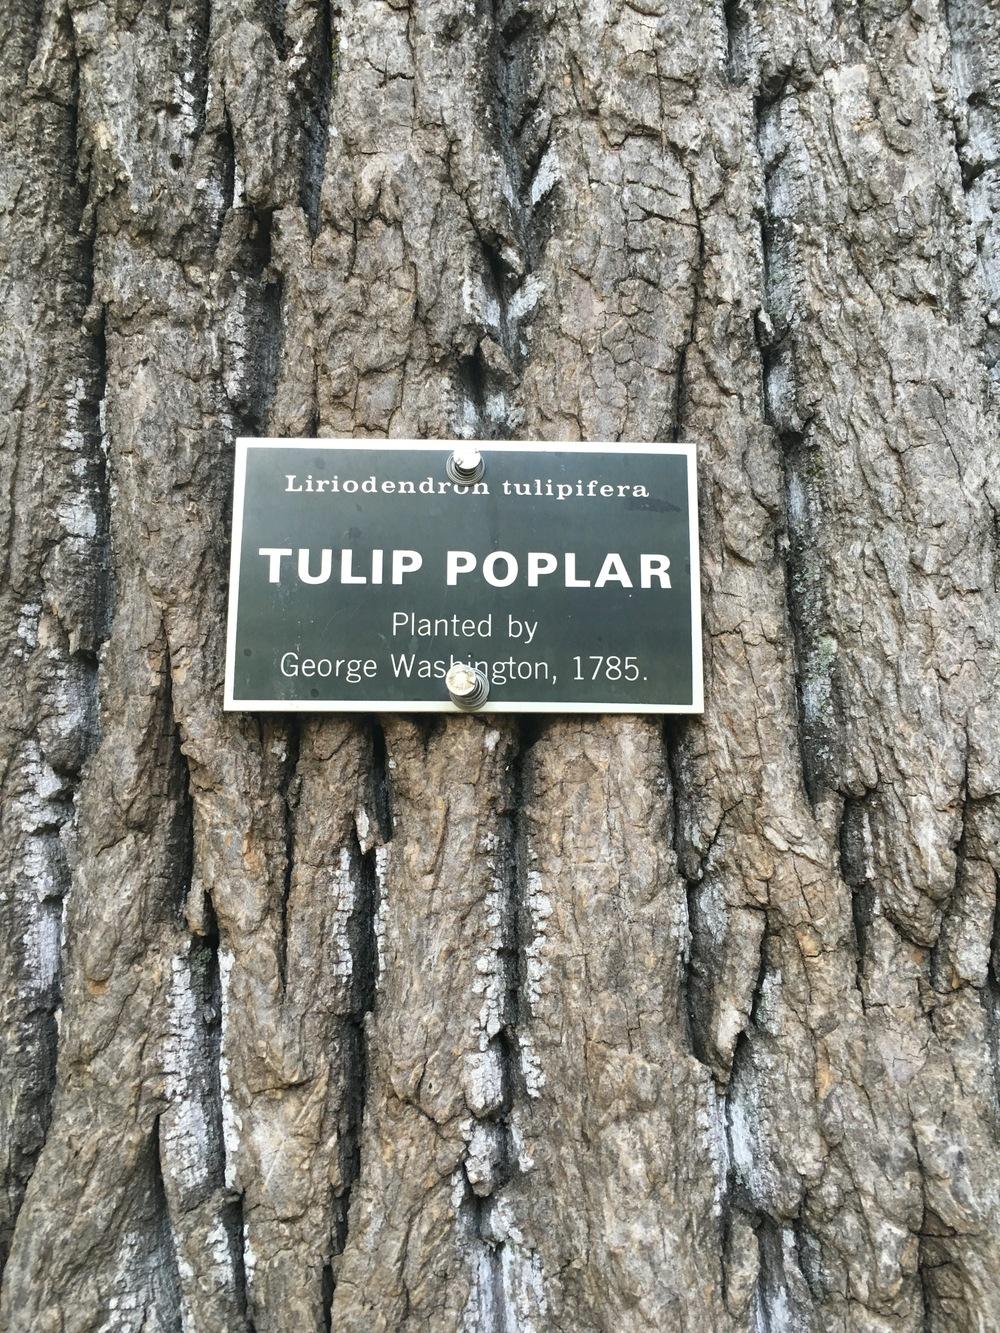 Mount Vernon Tulip Poplar